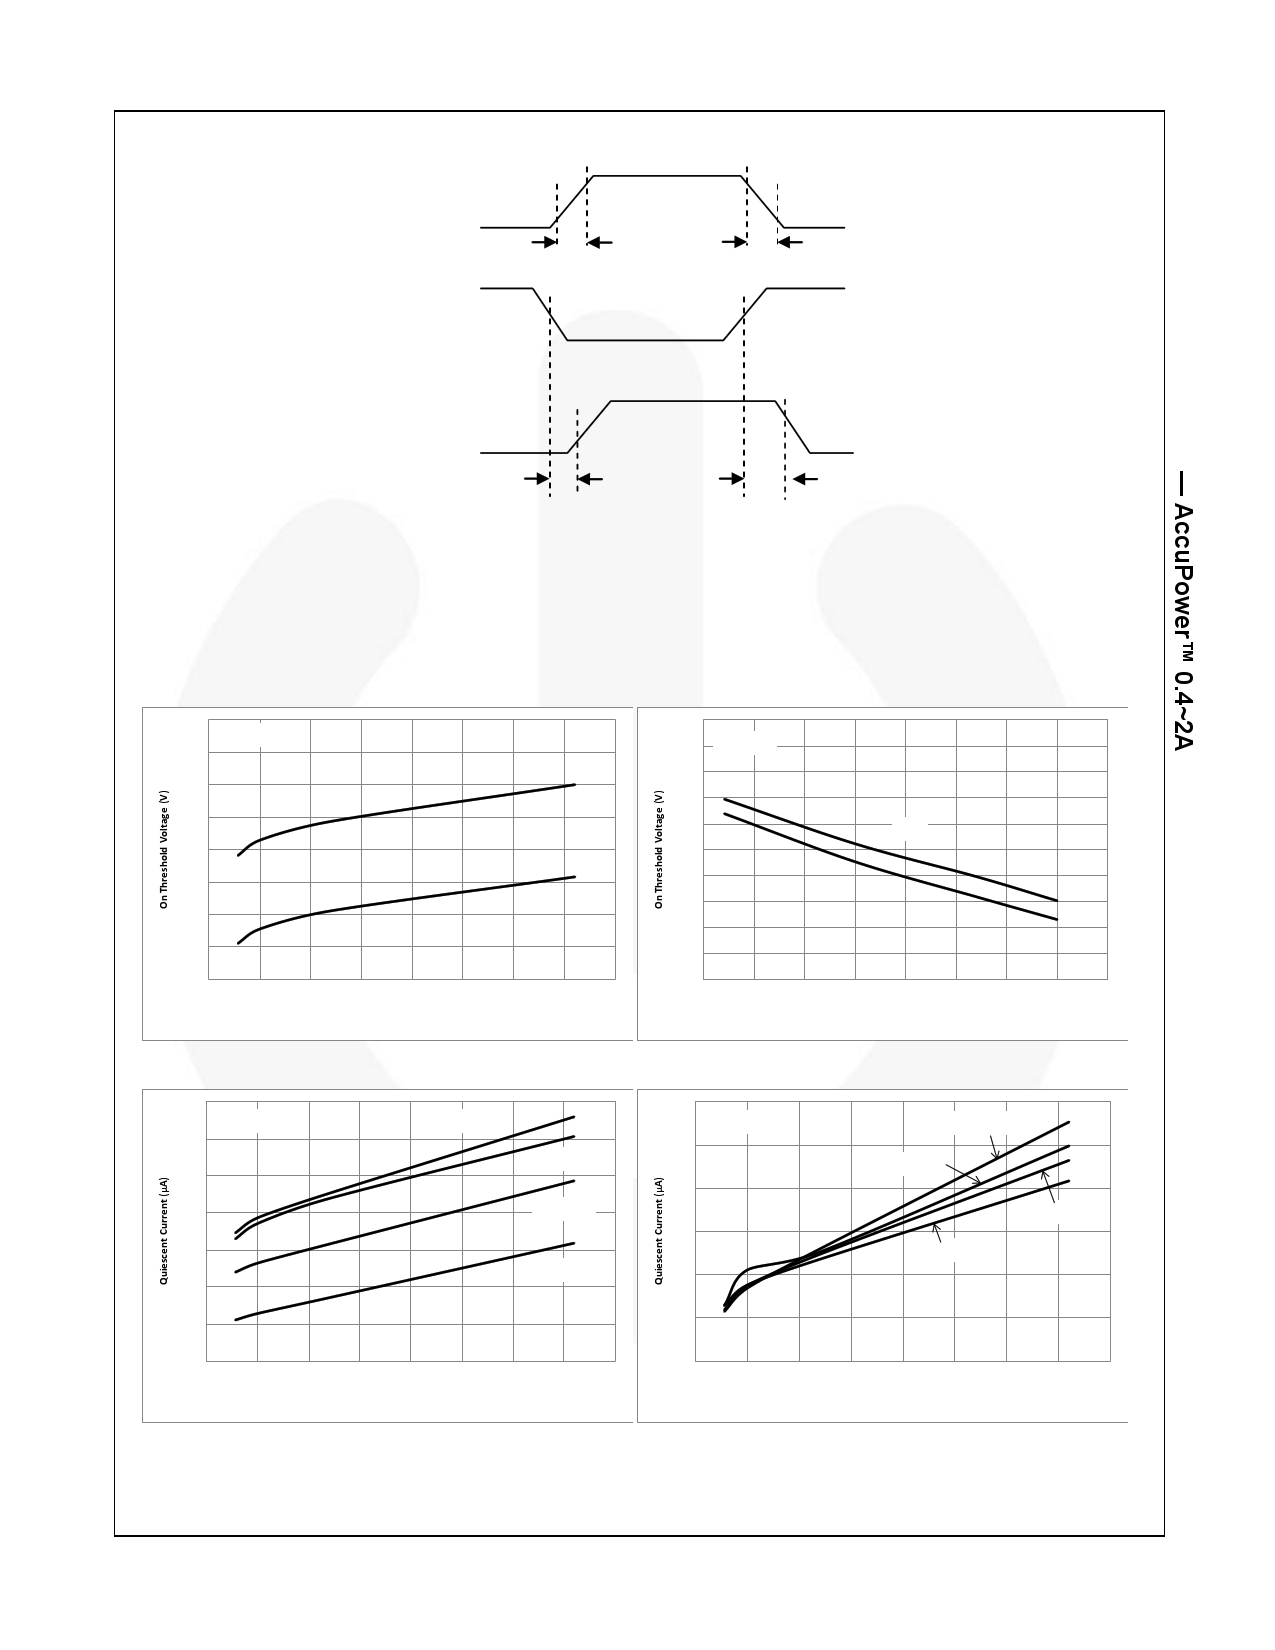 FPF2701 pdf